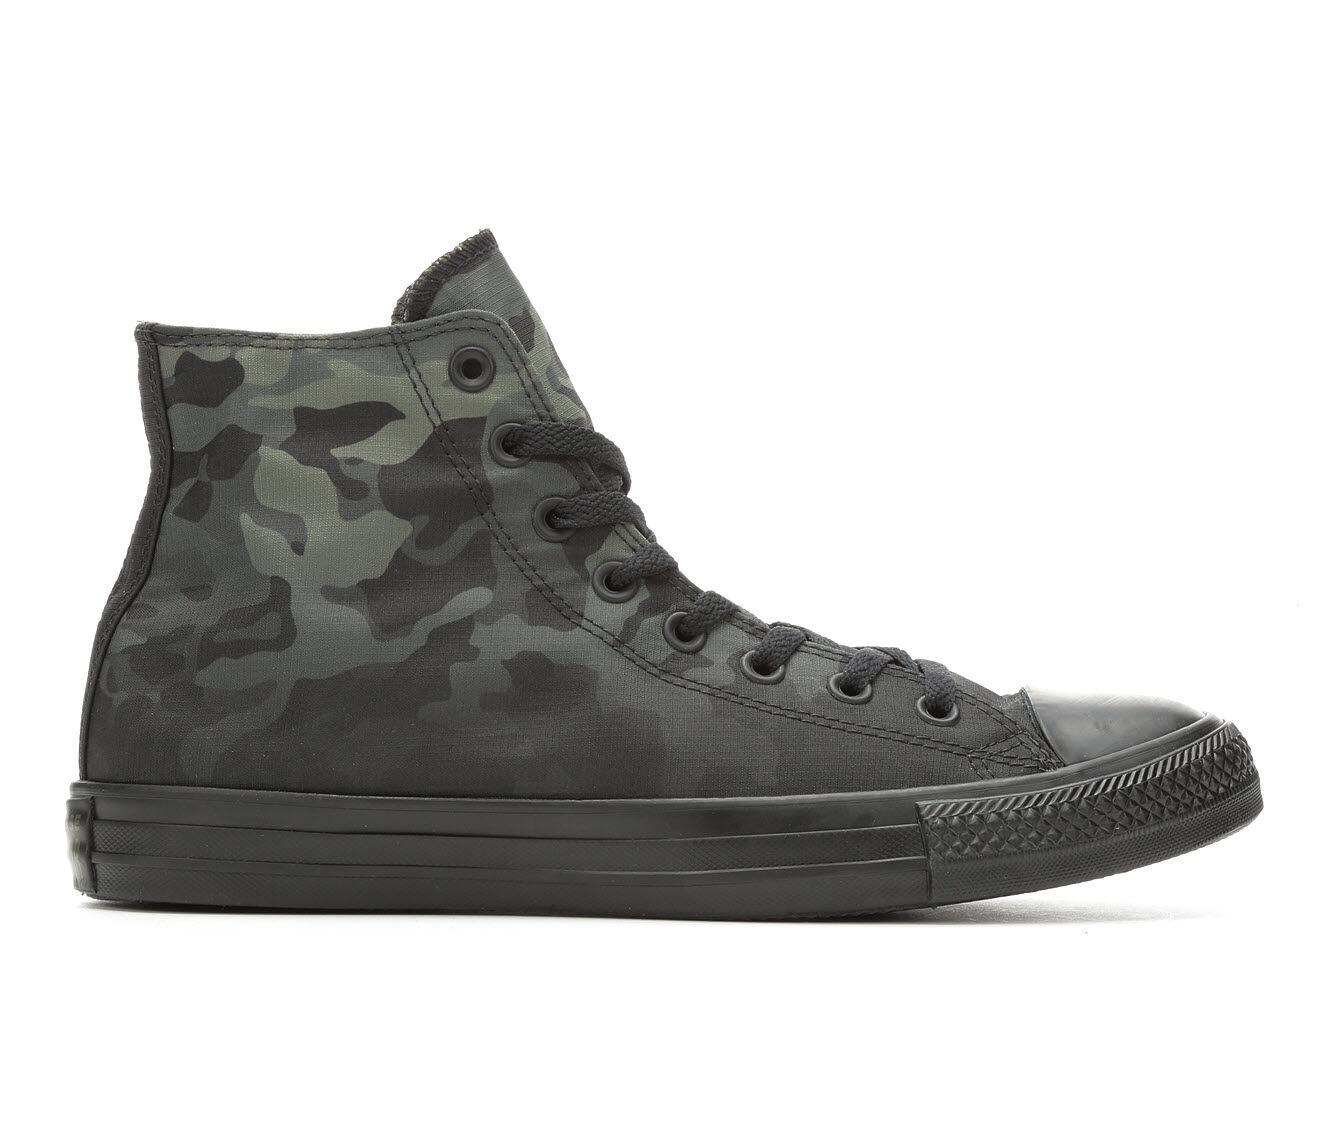 Superior Quality Men's Converse CTAS Gradient Camo High-Top Sneakers Blk/Camo